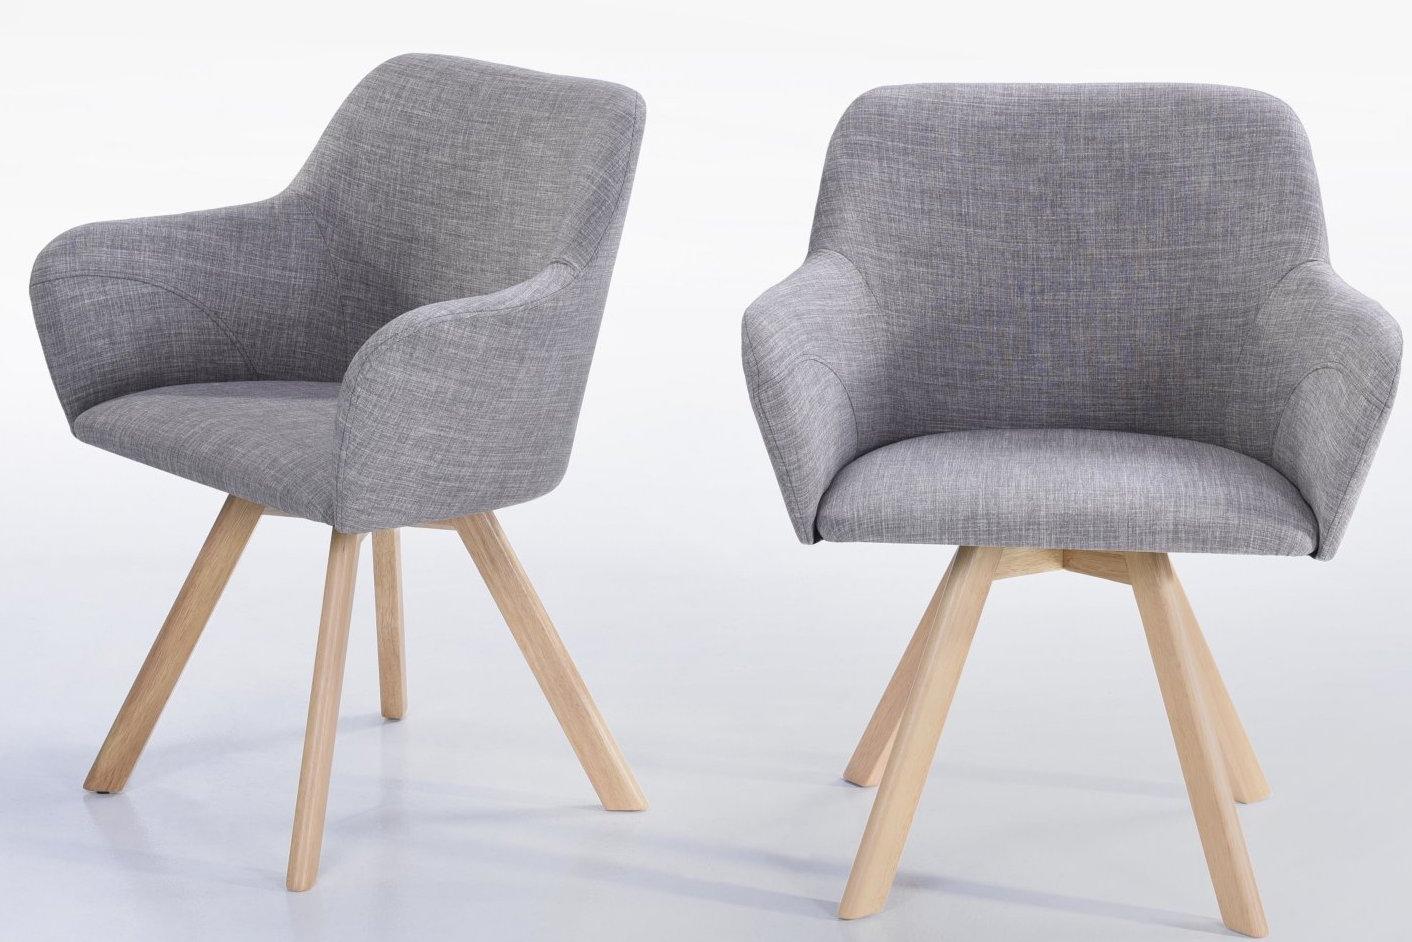 fauteuil contemporain castle. Black Bedroom Furniture Sets. Home Design Ideas